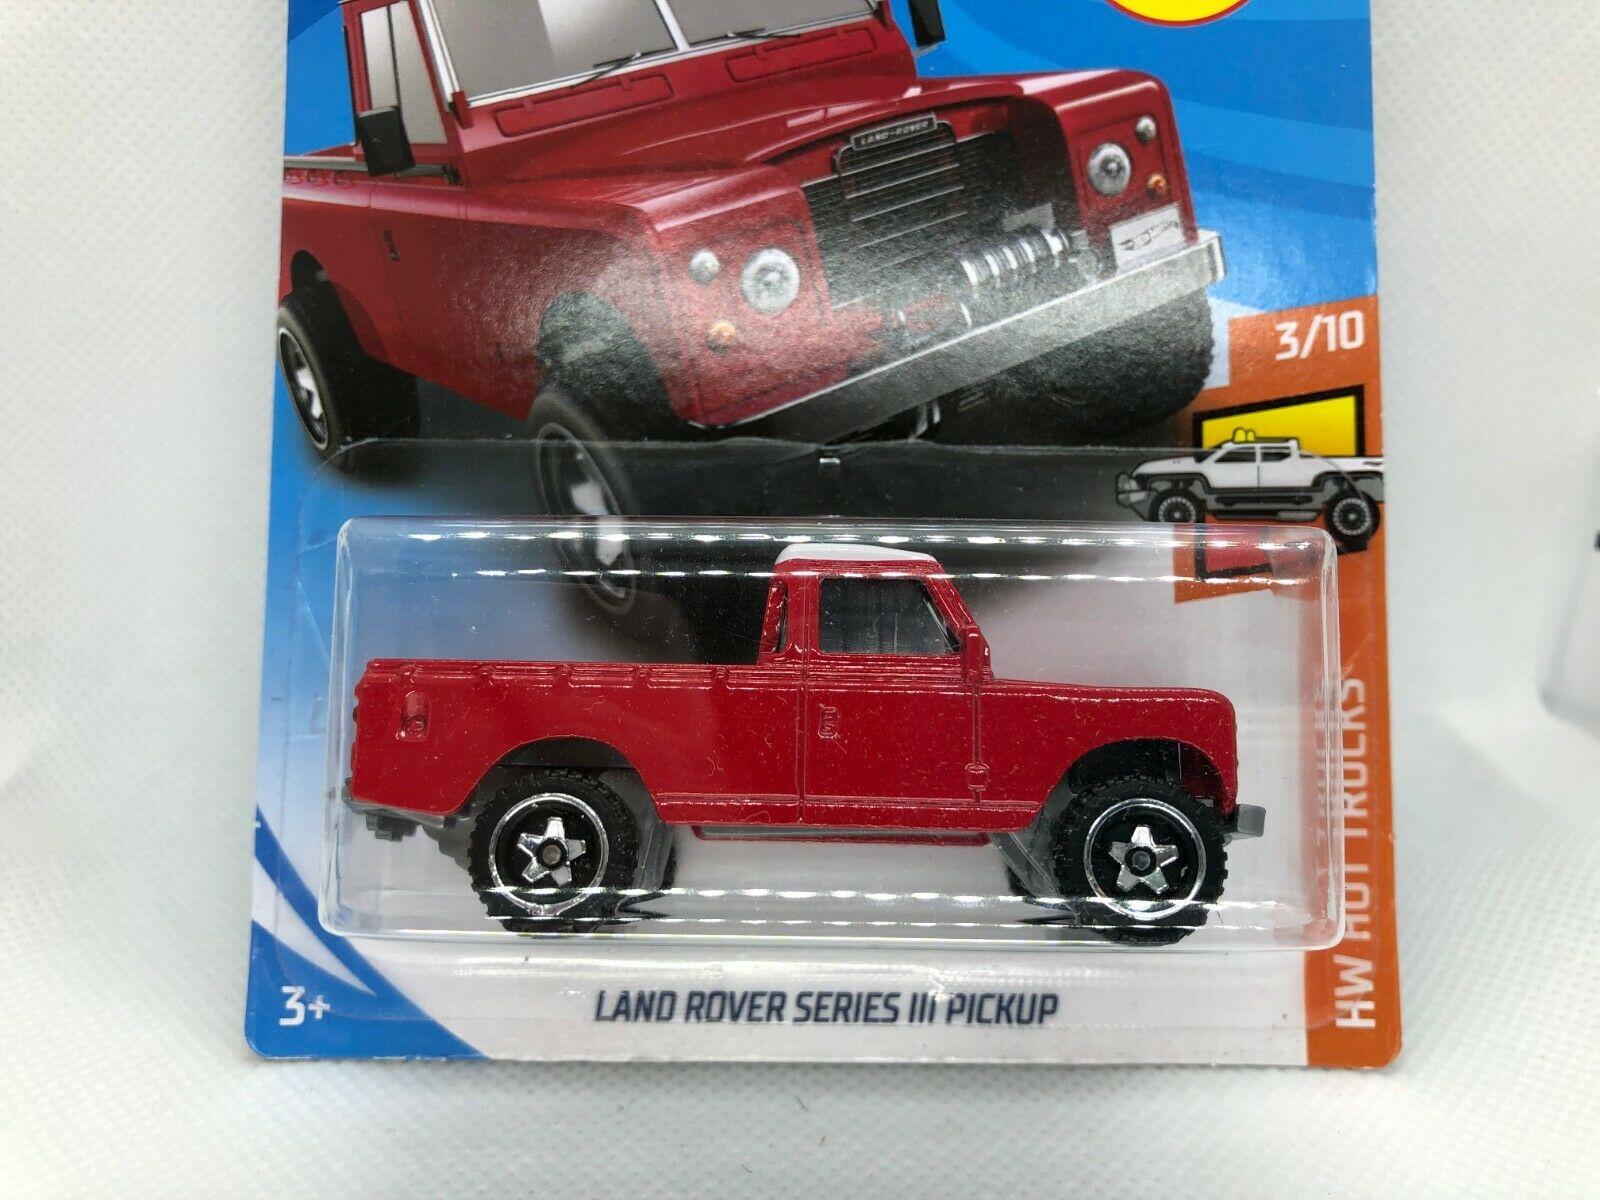 Land Rover Series III Pickup